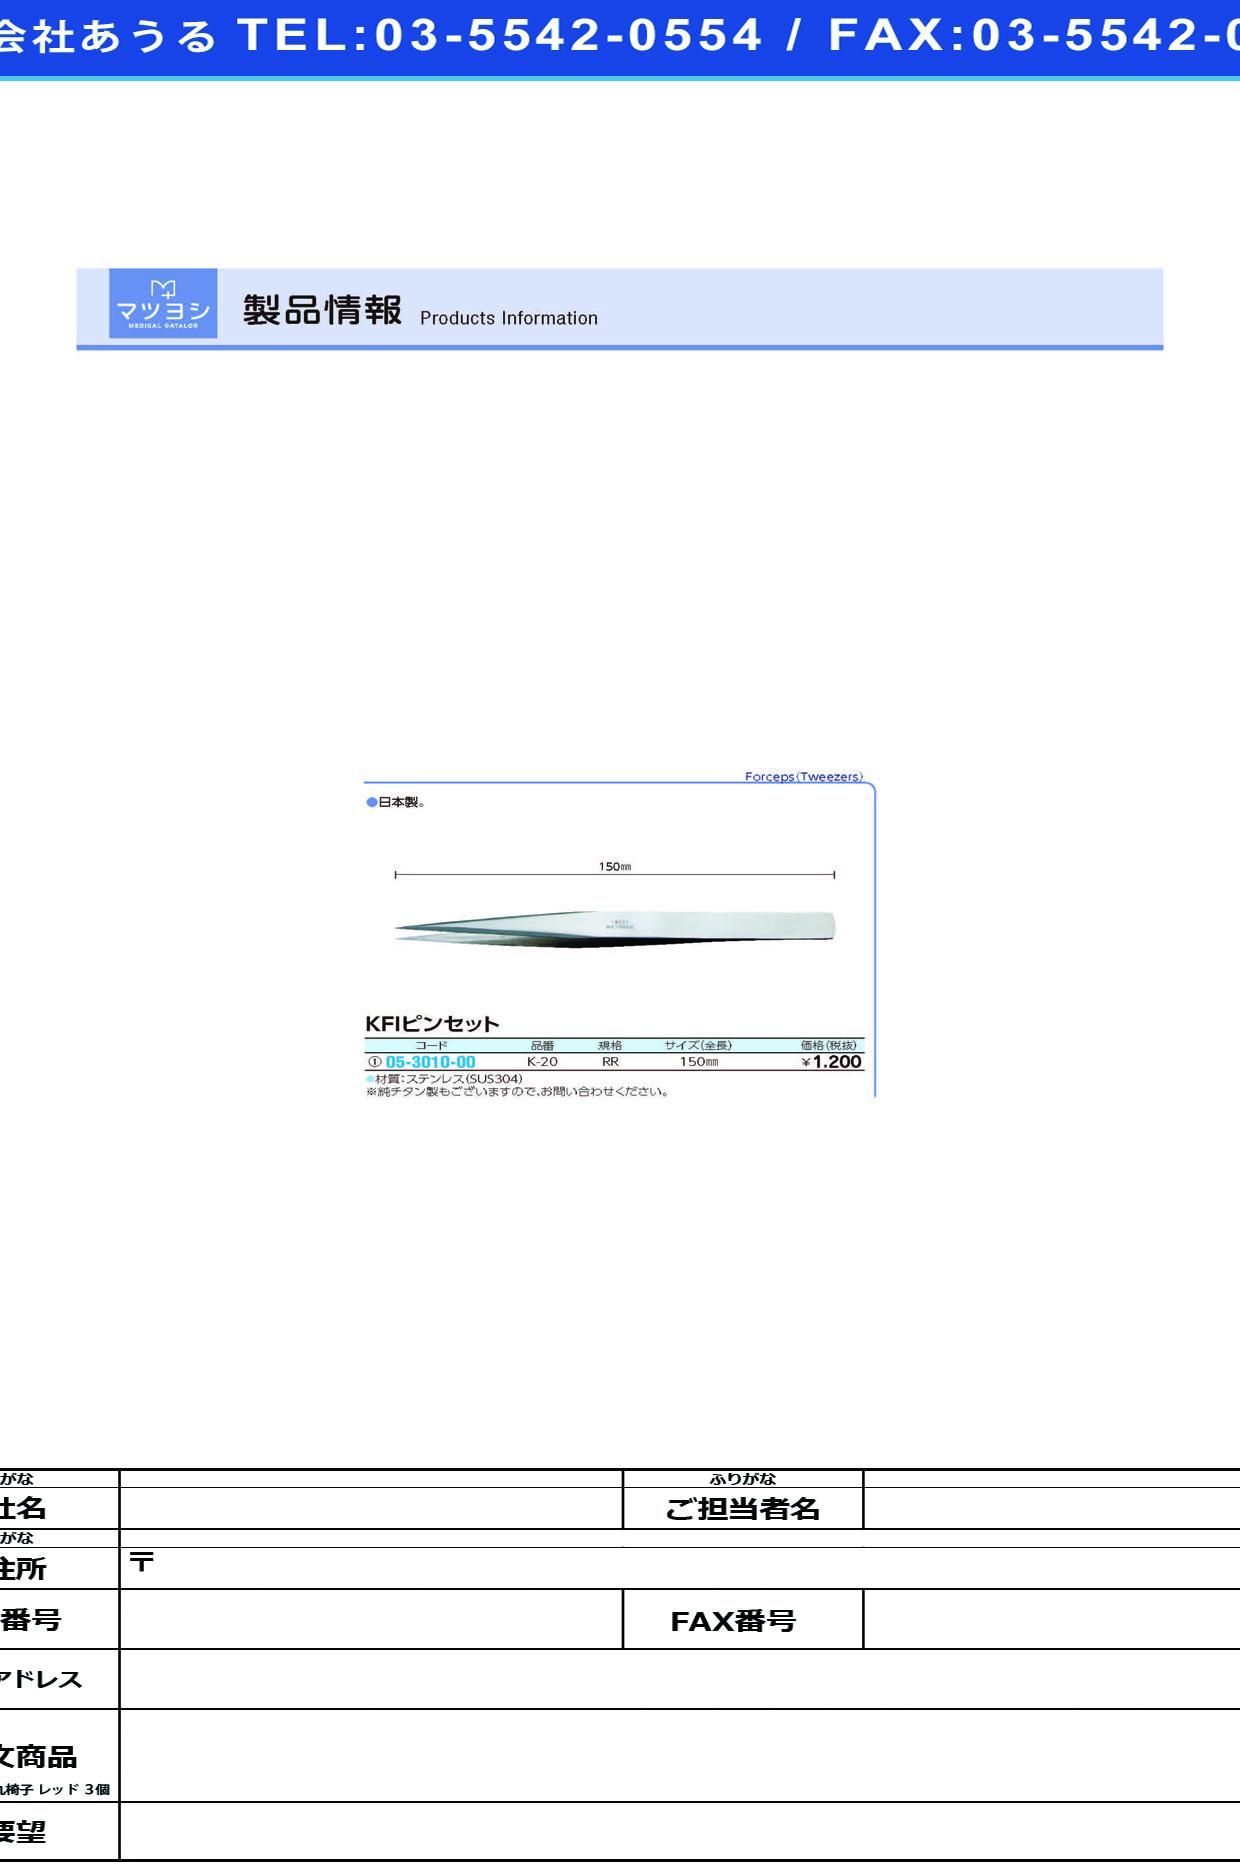 (05-3010-00)KFIピンセットRR K-20(ステンレス)150MM ピンセット【1本単位】【2019年カタログ商品】